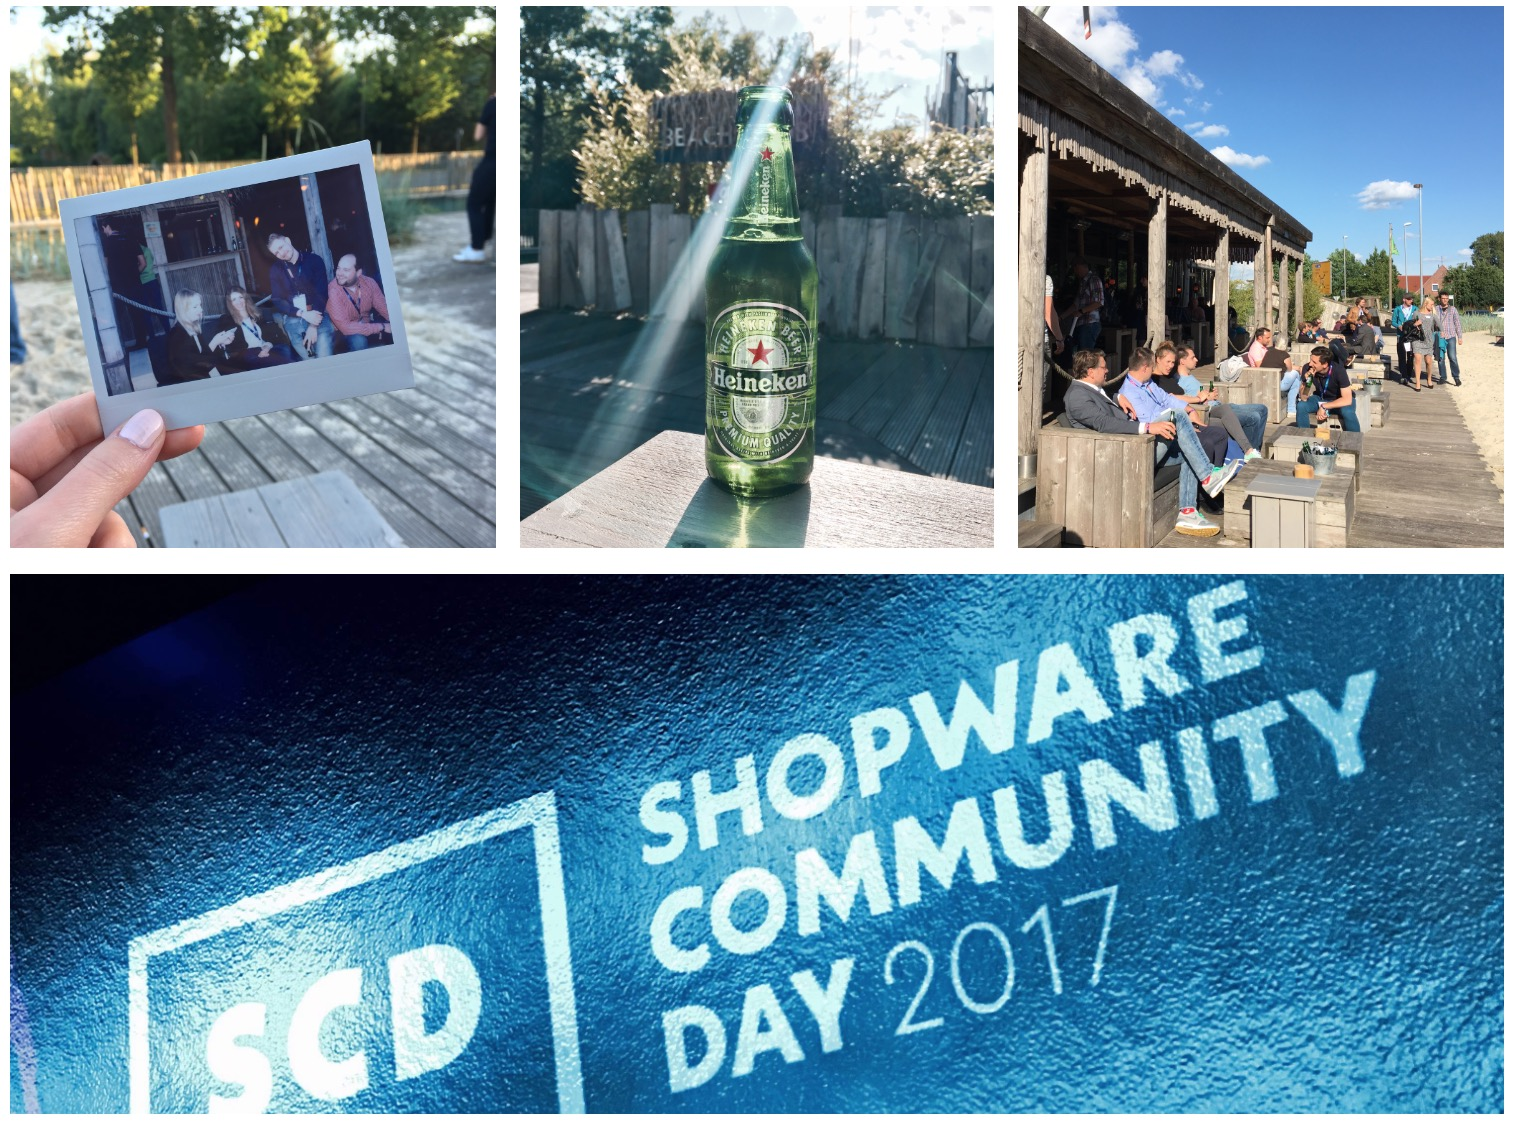 Shopware Community Day 2017